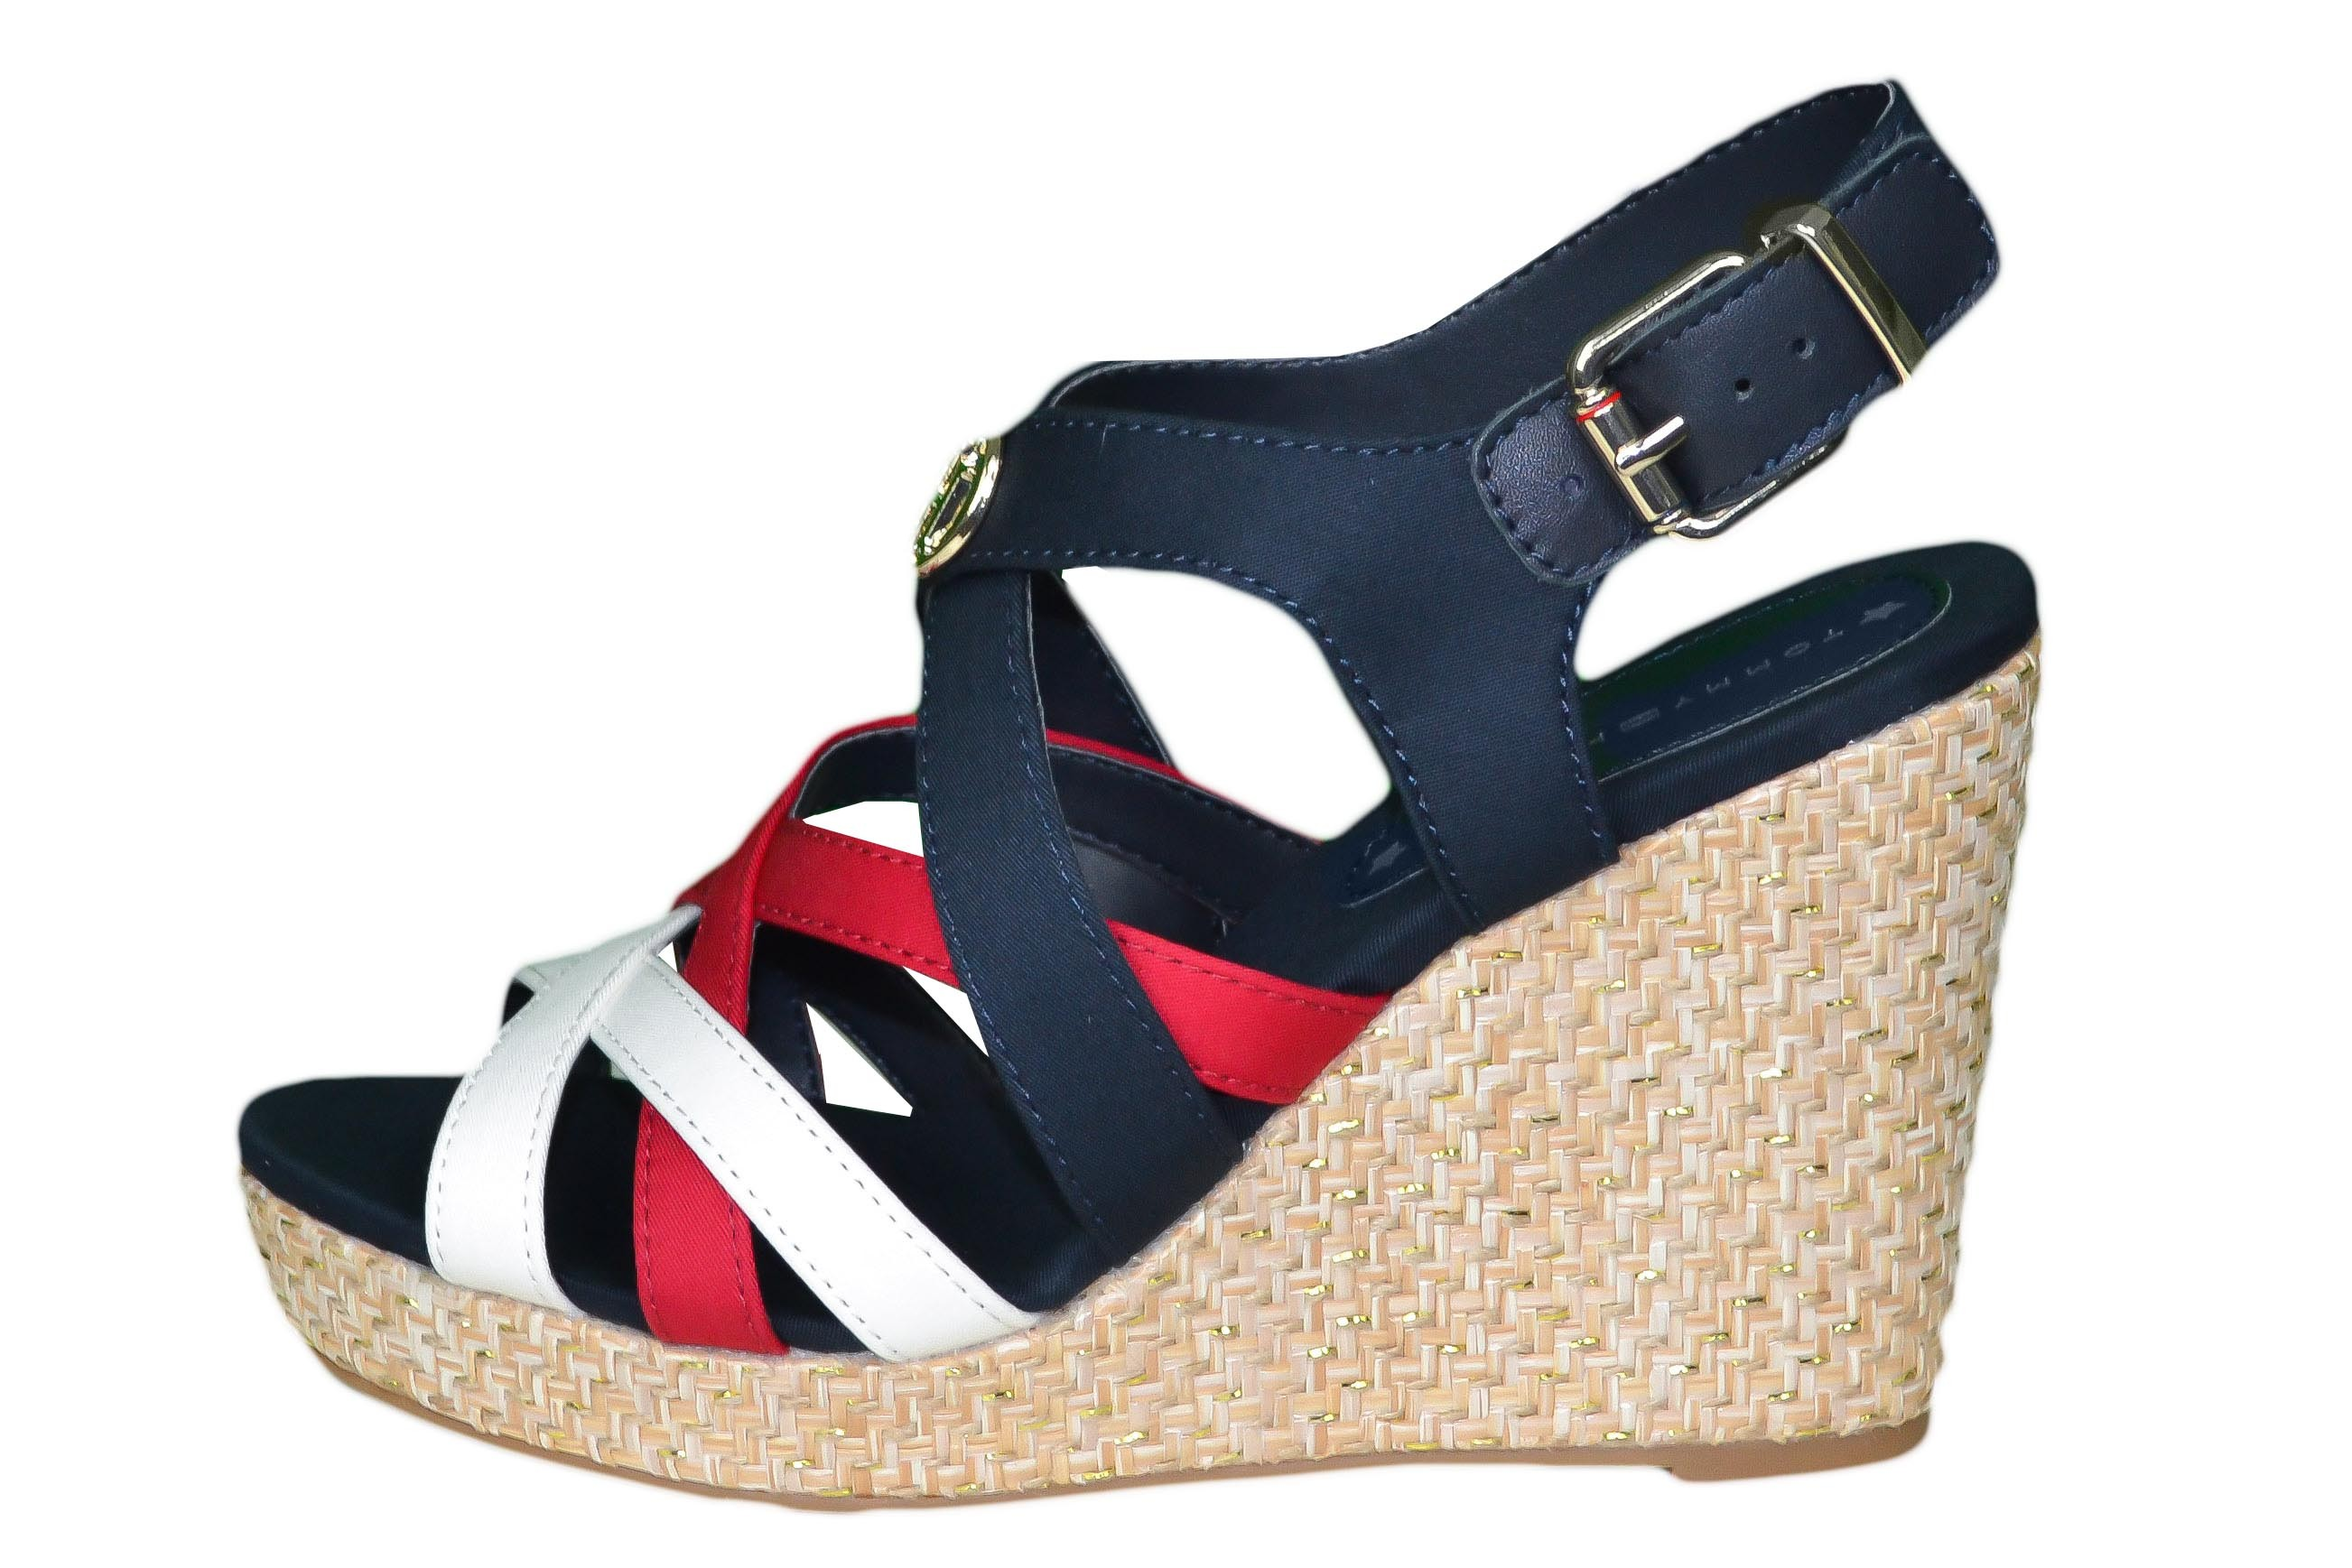 Sandales compensées Tommy Hilfiger bleu marine rouge et blanc Elena